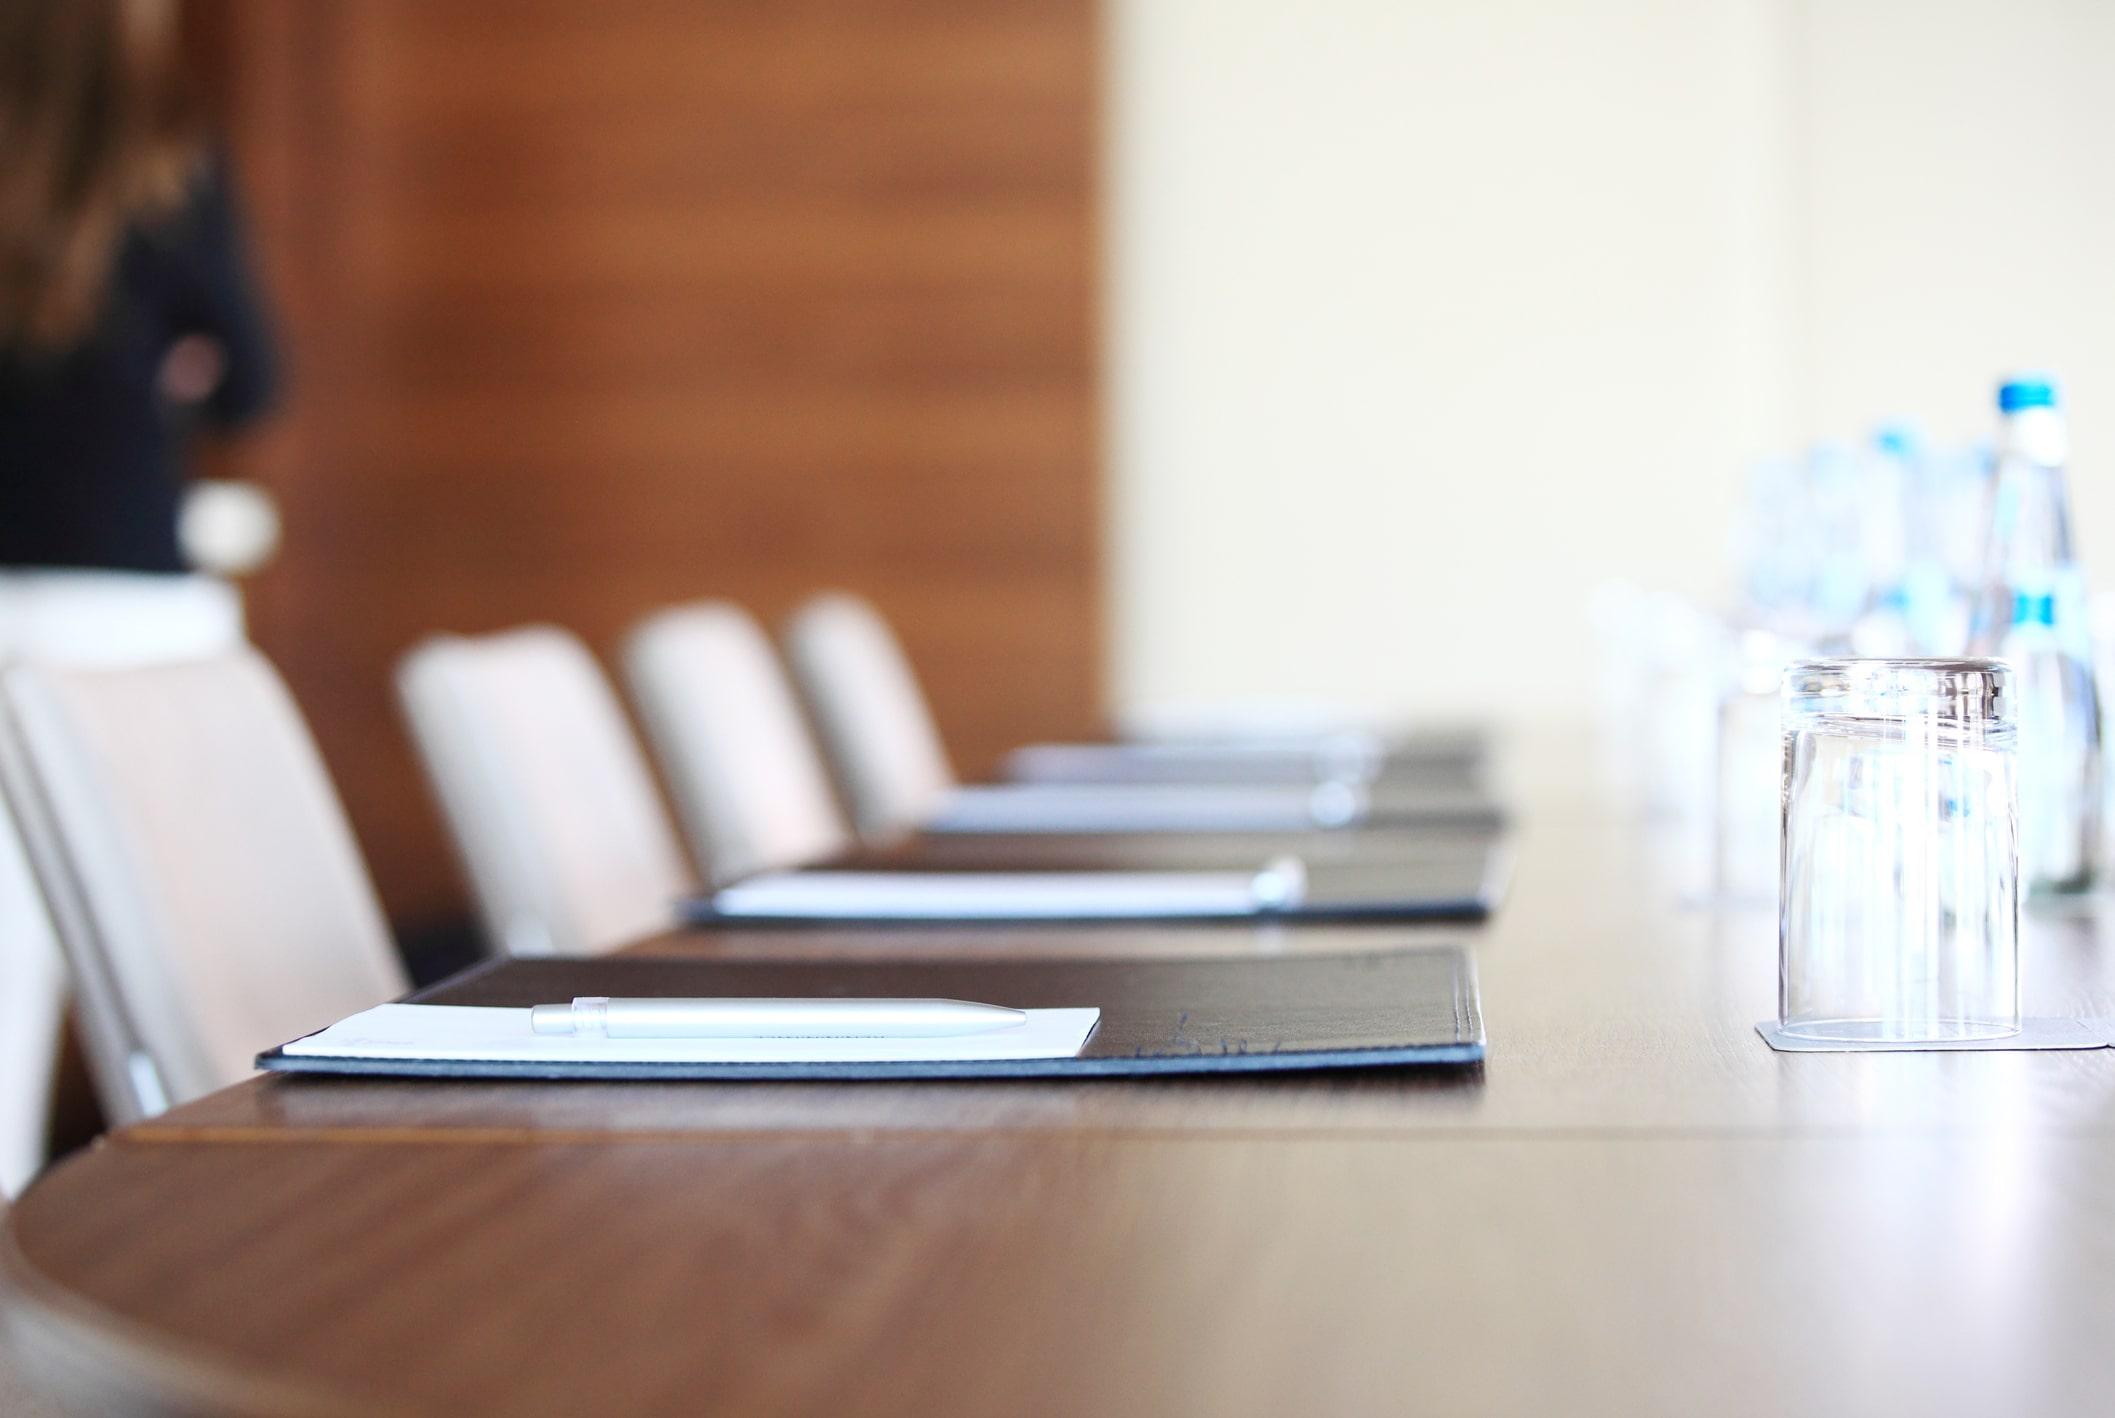 Meeting Room Rentals vs Hotel Spaces